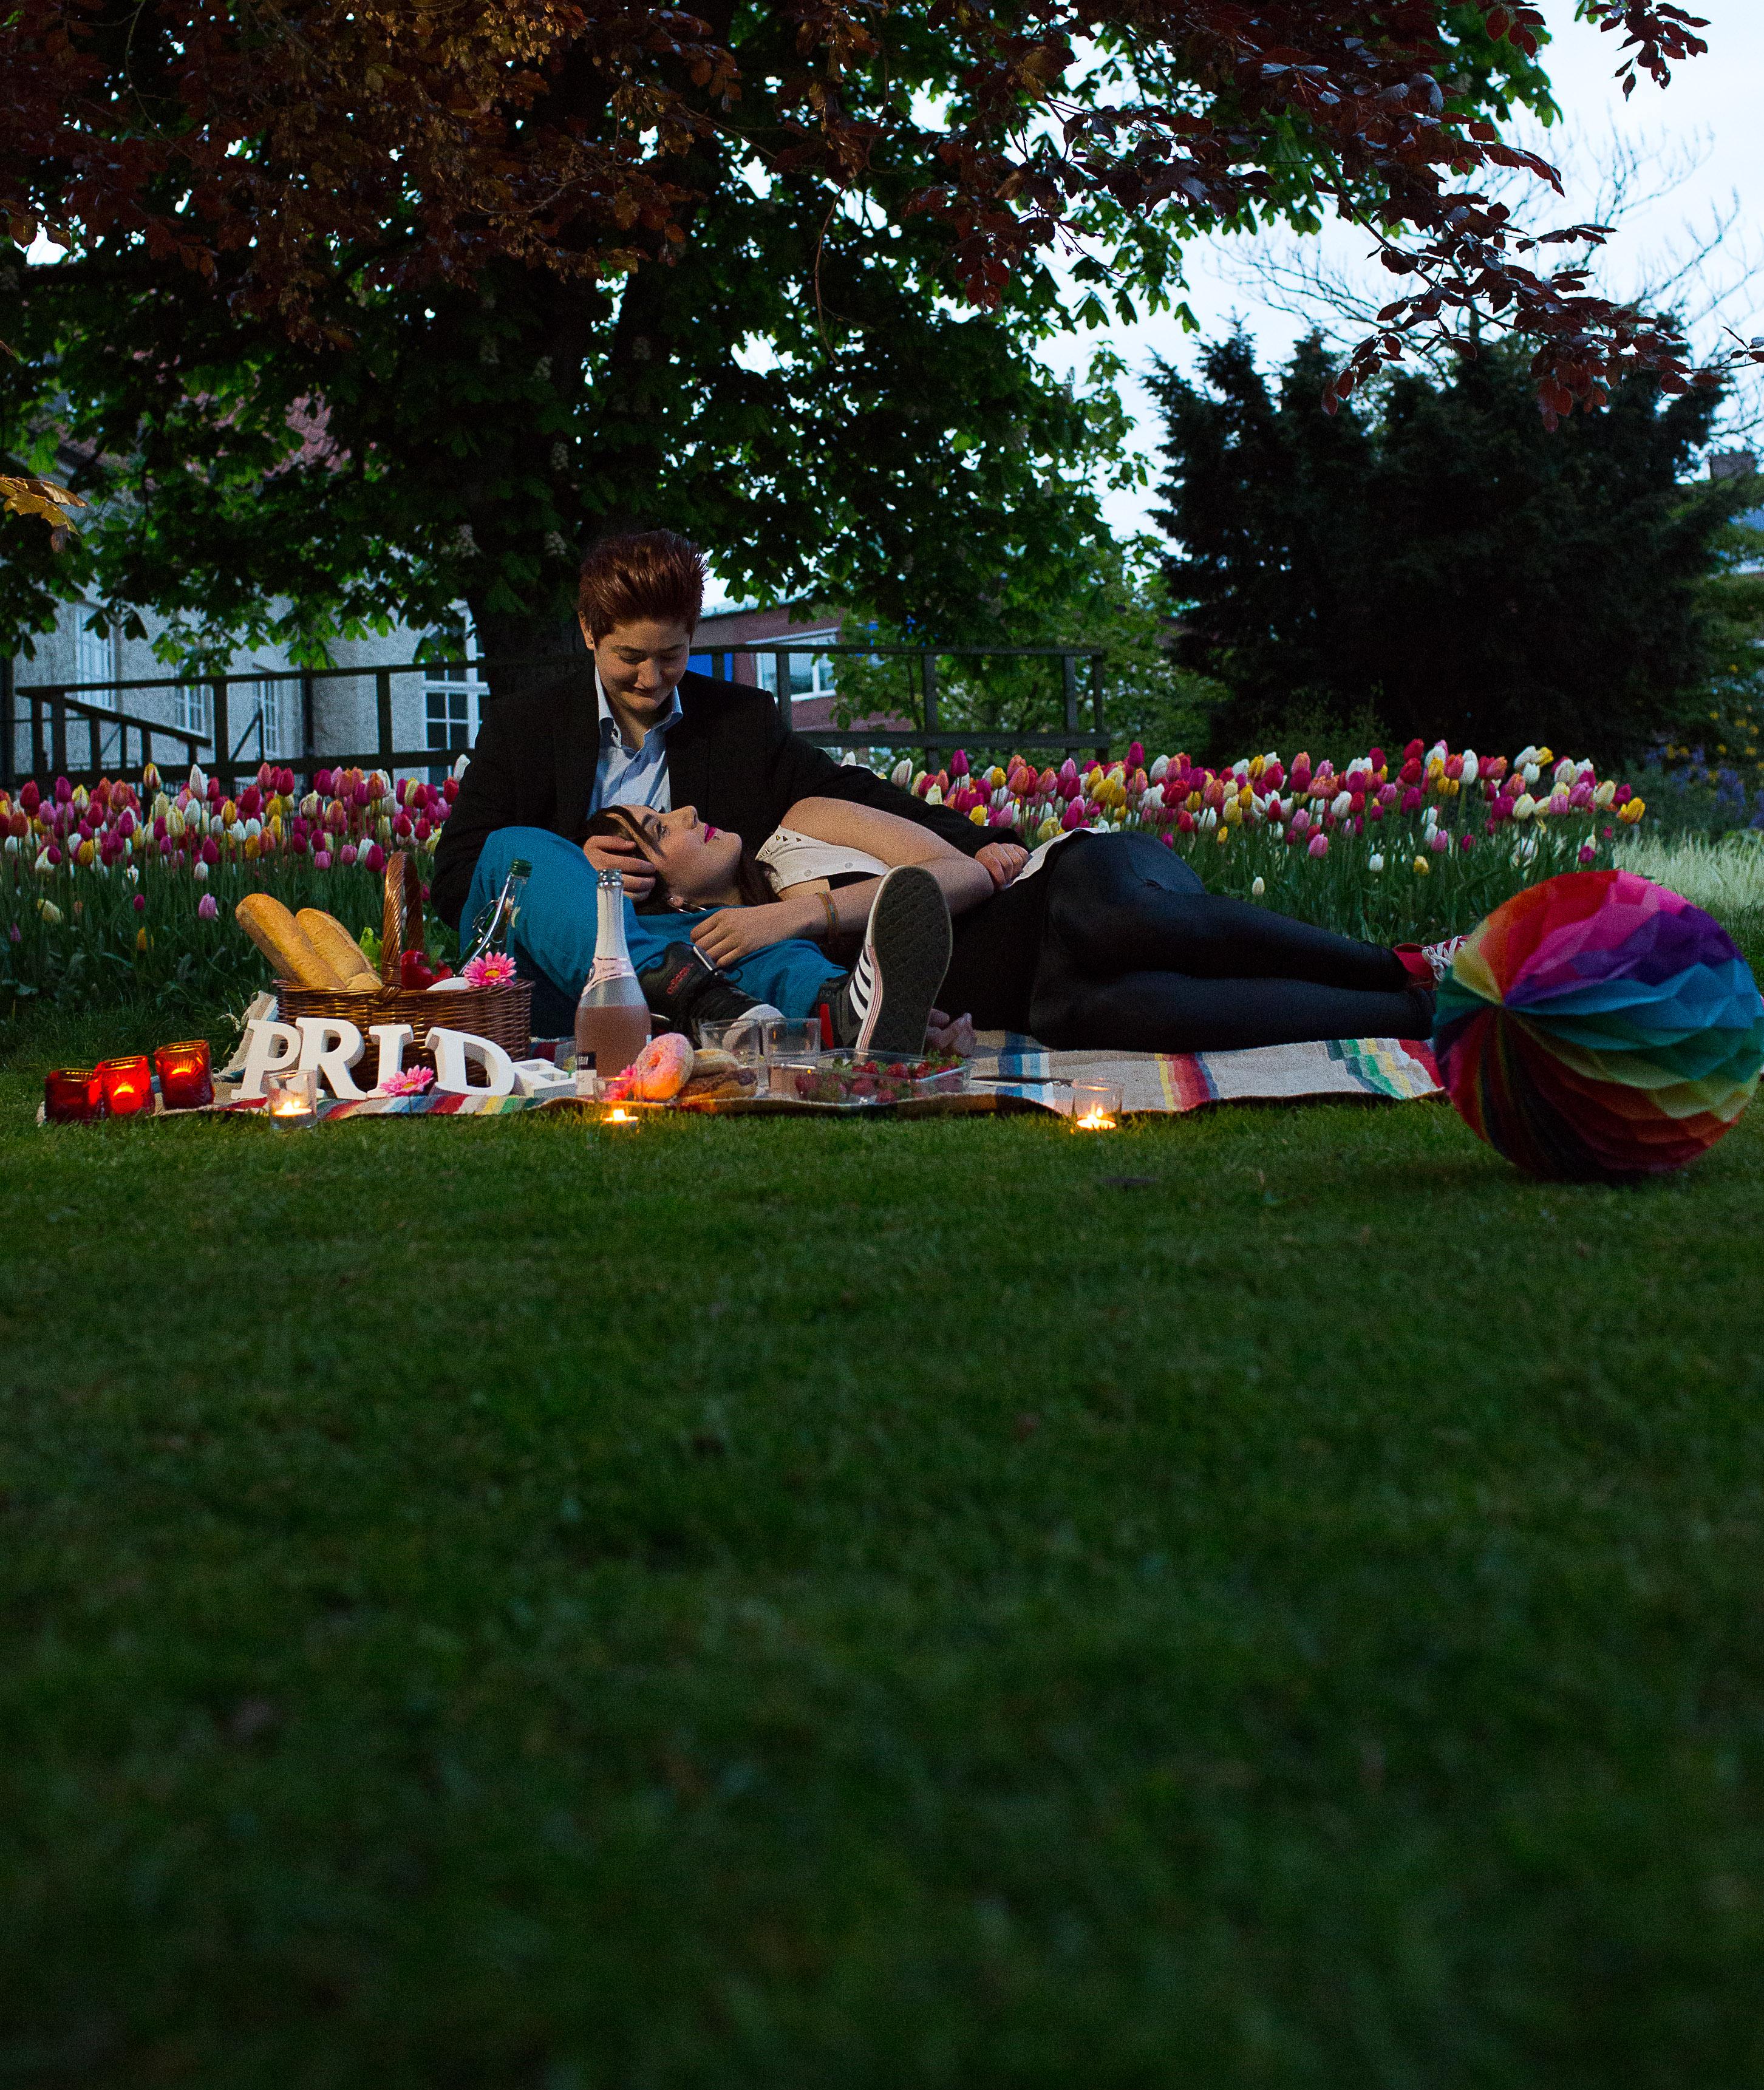 pride falkenberg - pressfoto